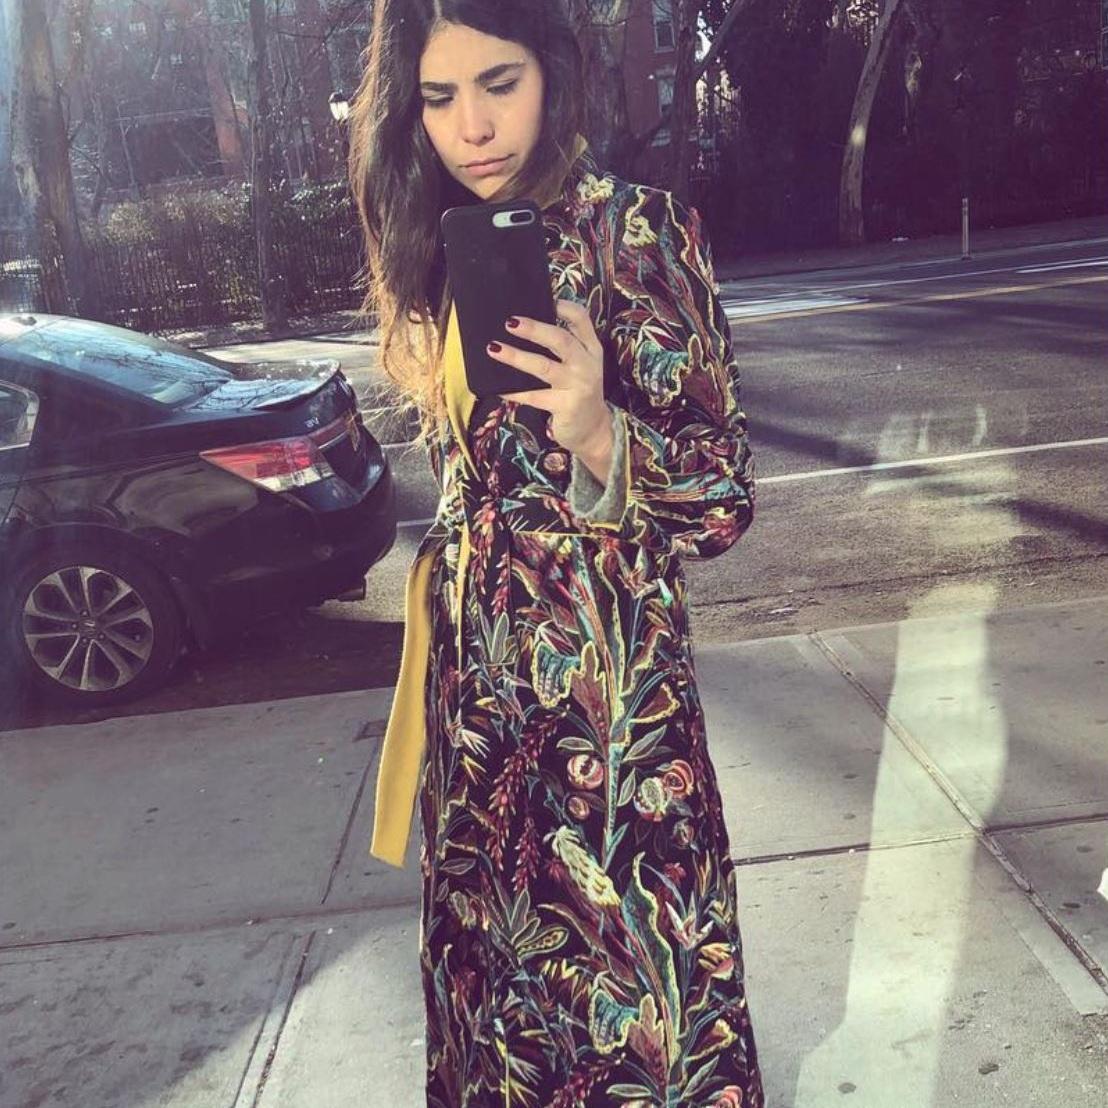 ISABELLA BEHRENS - Sol y Sombra Kimono  #prmogul #creoconsulting #creative #almagril girlboss  @NYC